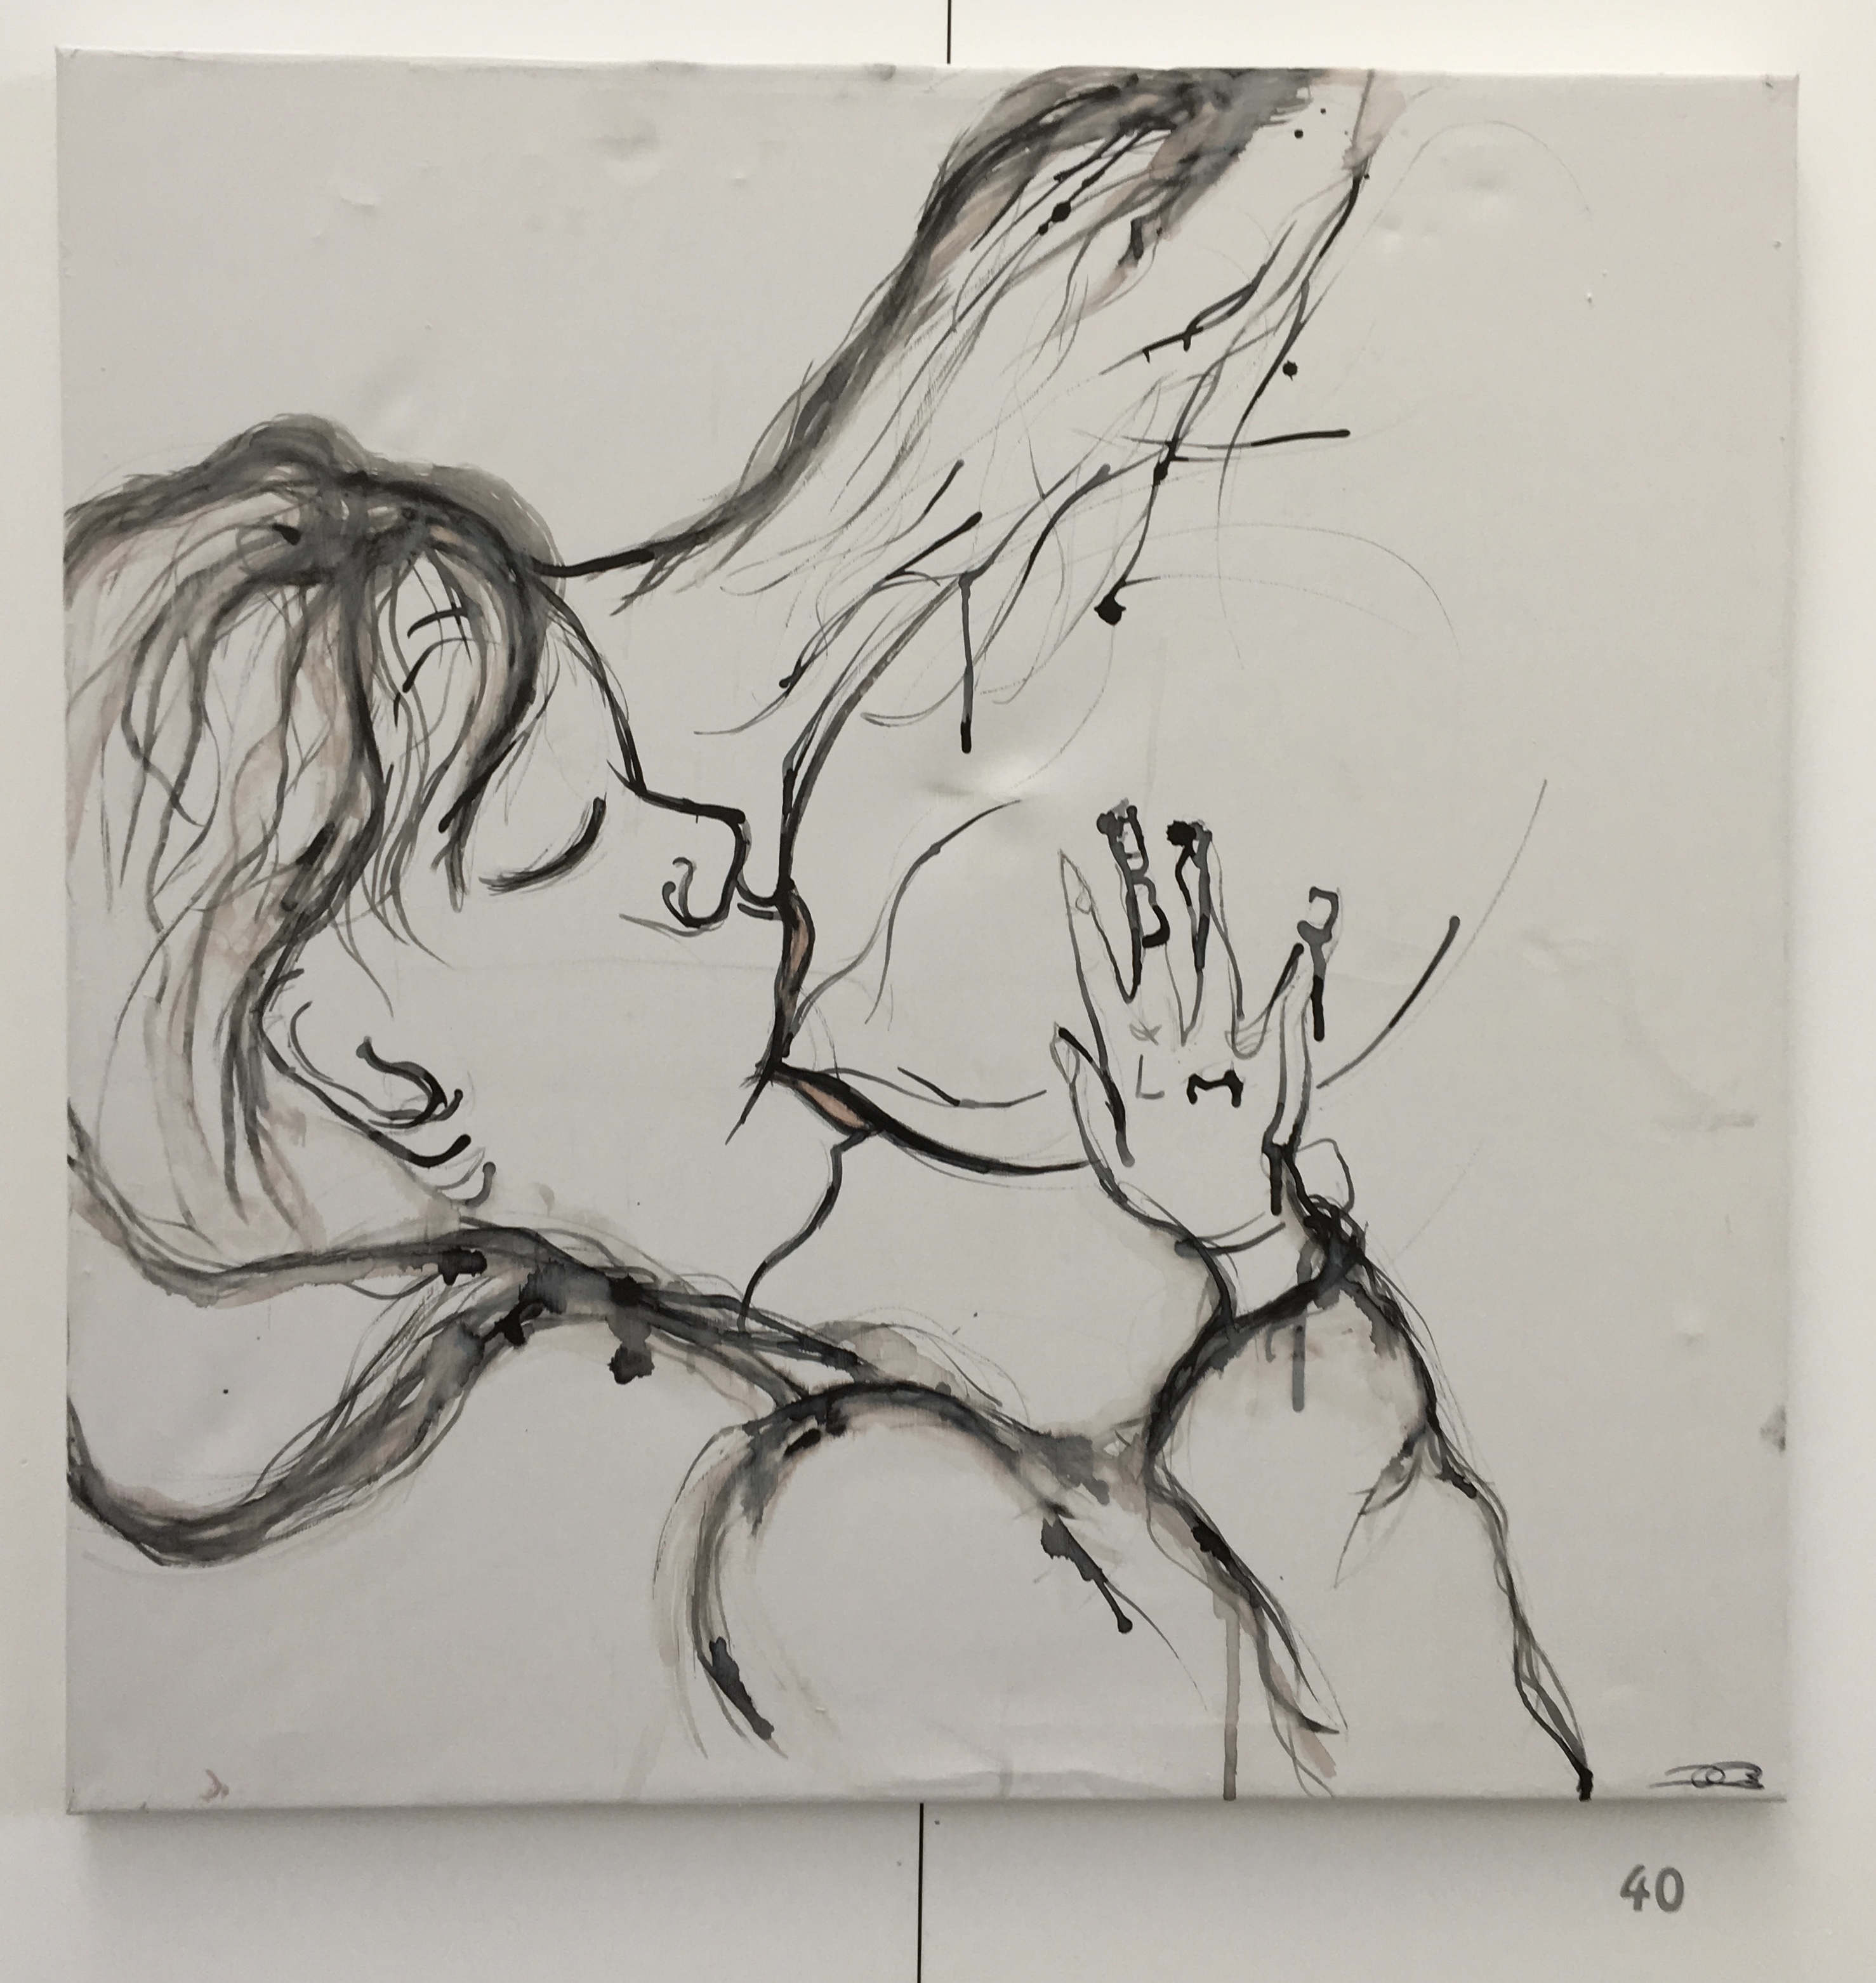 40. Untitled, Billy Jean Croll, 68 x 68 x 2, £ offers